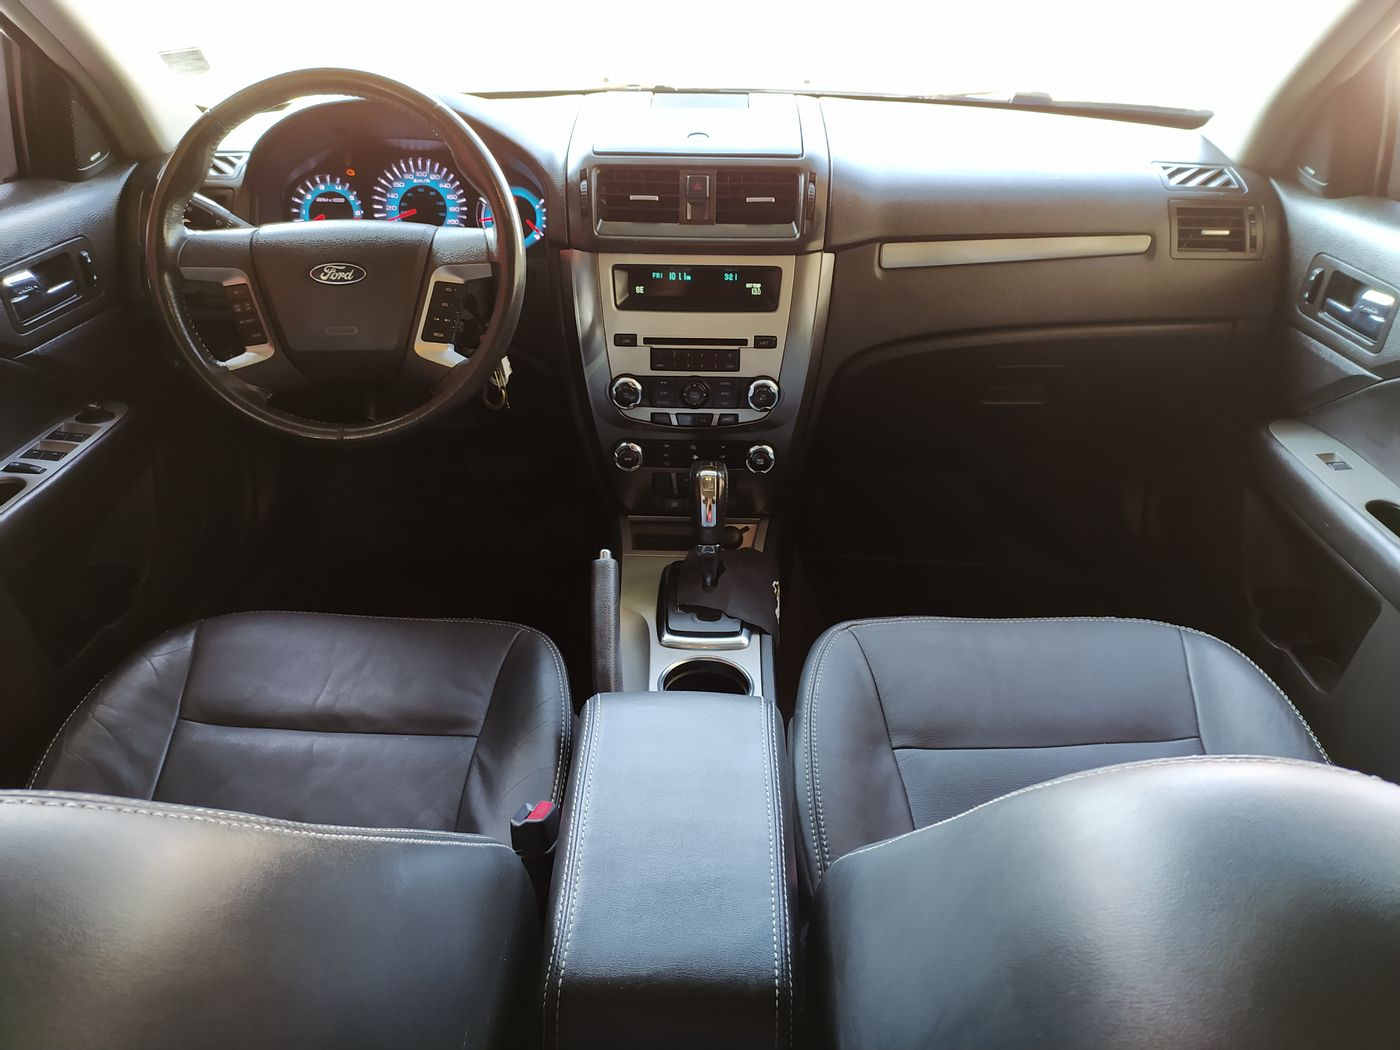 Ford Fusion SEL 2.5 16V 173cv Aut.